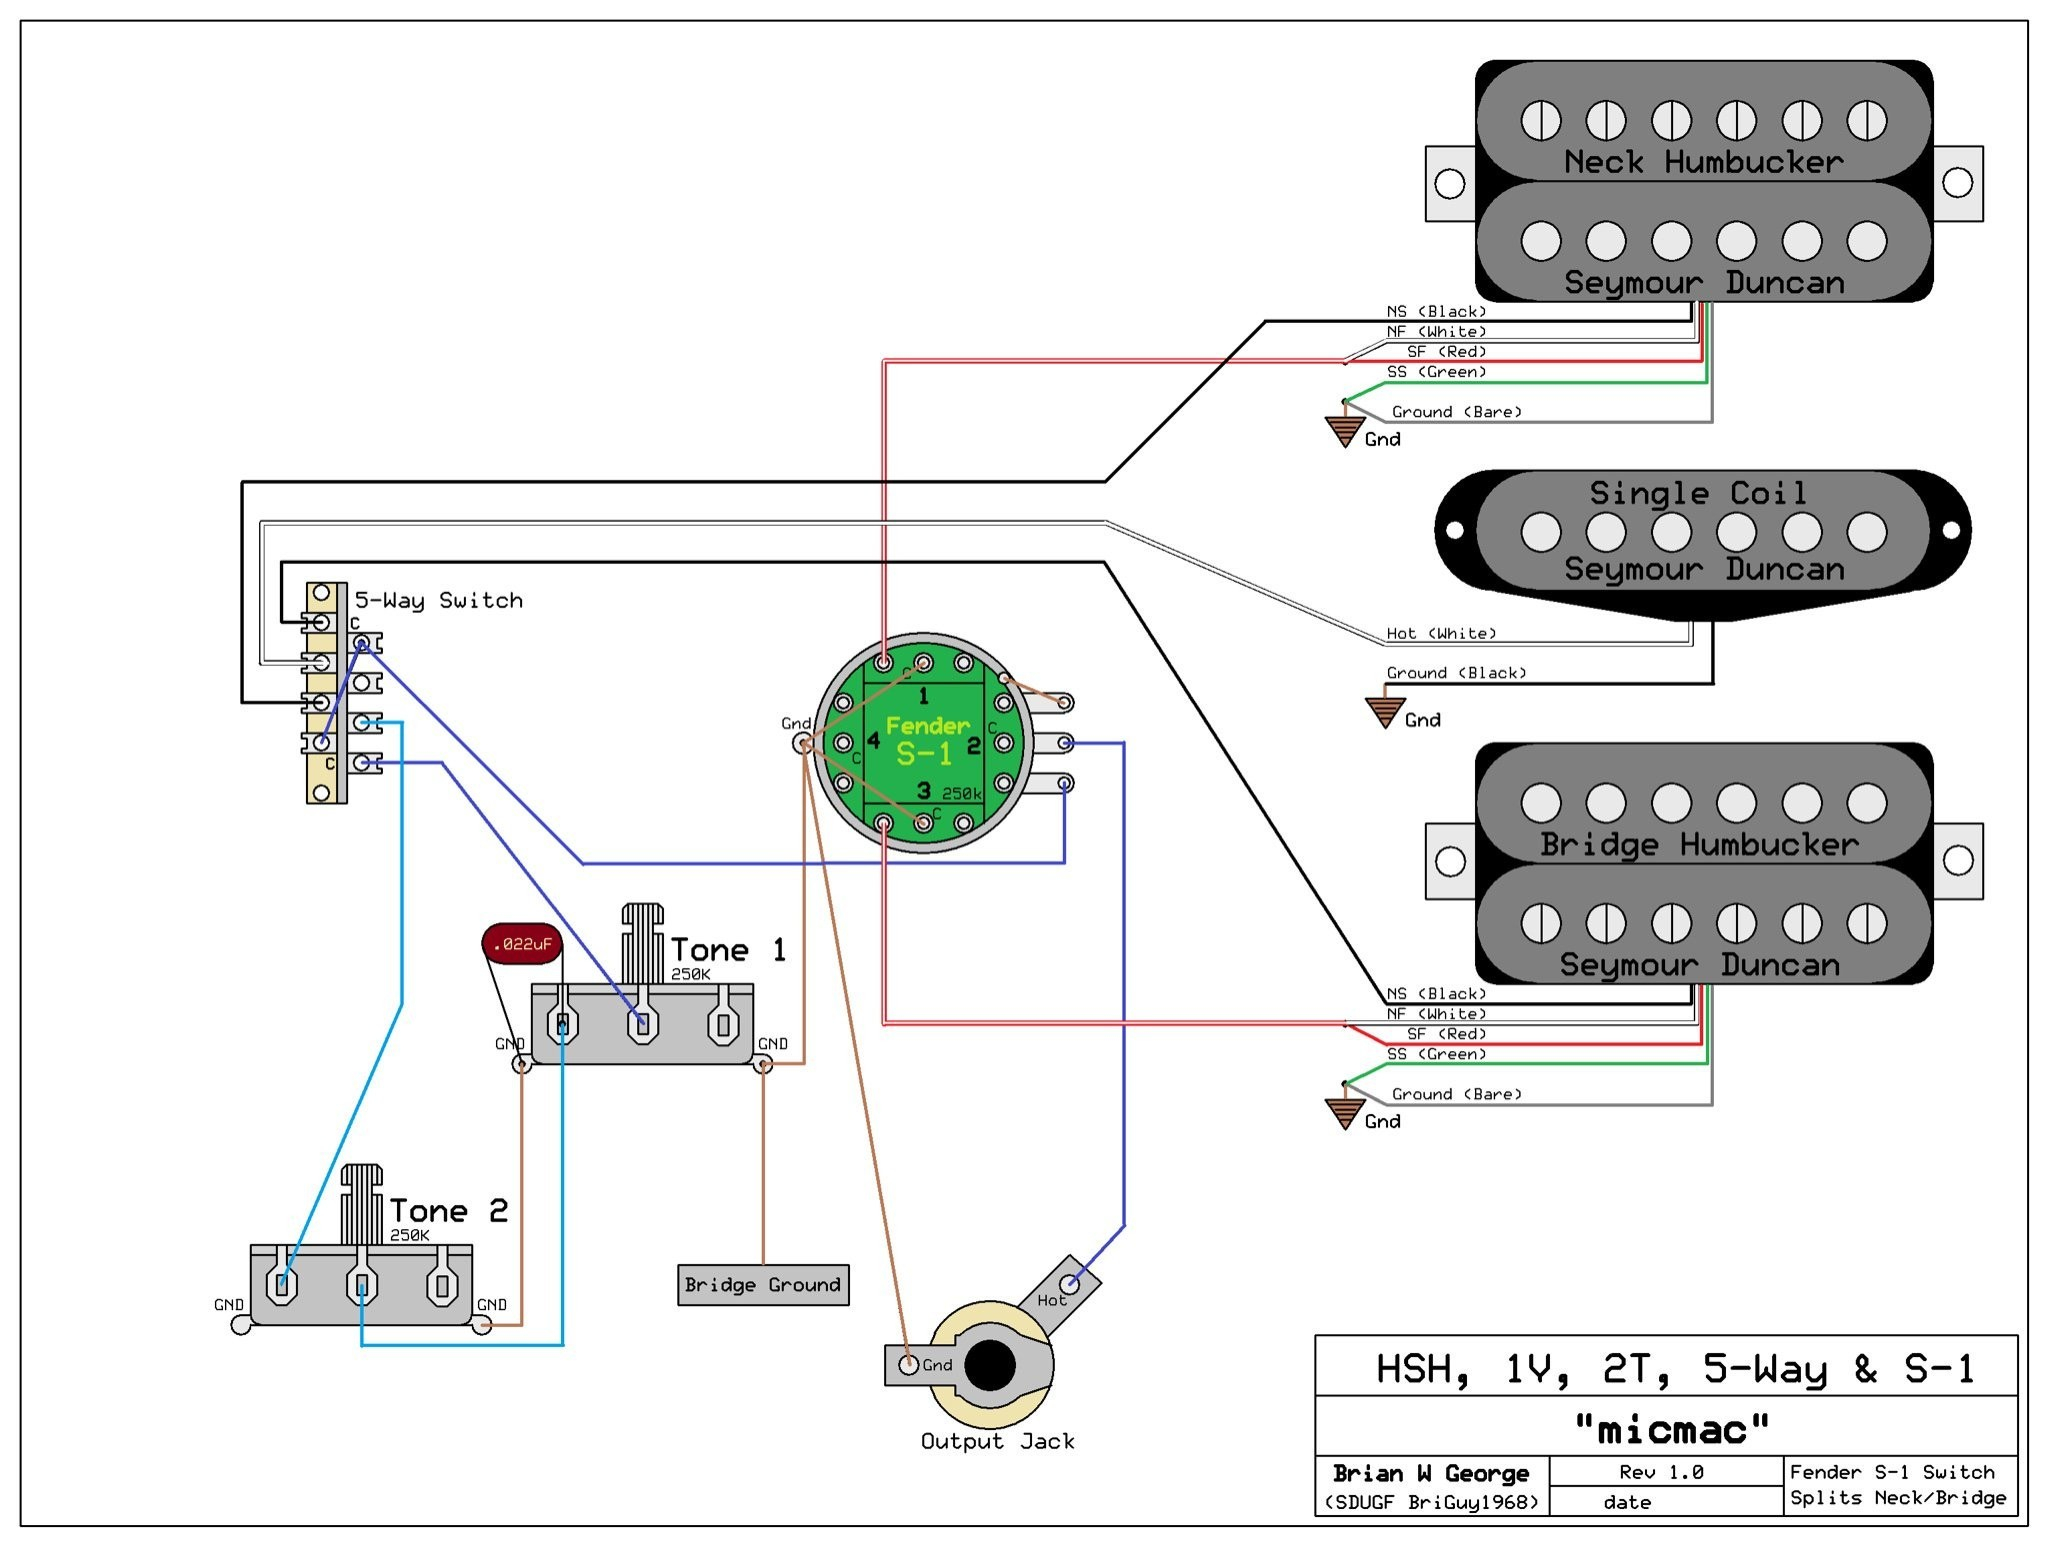 Guitar Wiring Diagrams Guitar Wiring For Dummies Free As Well As Fender Humbucker Wiring